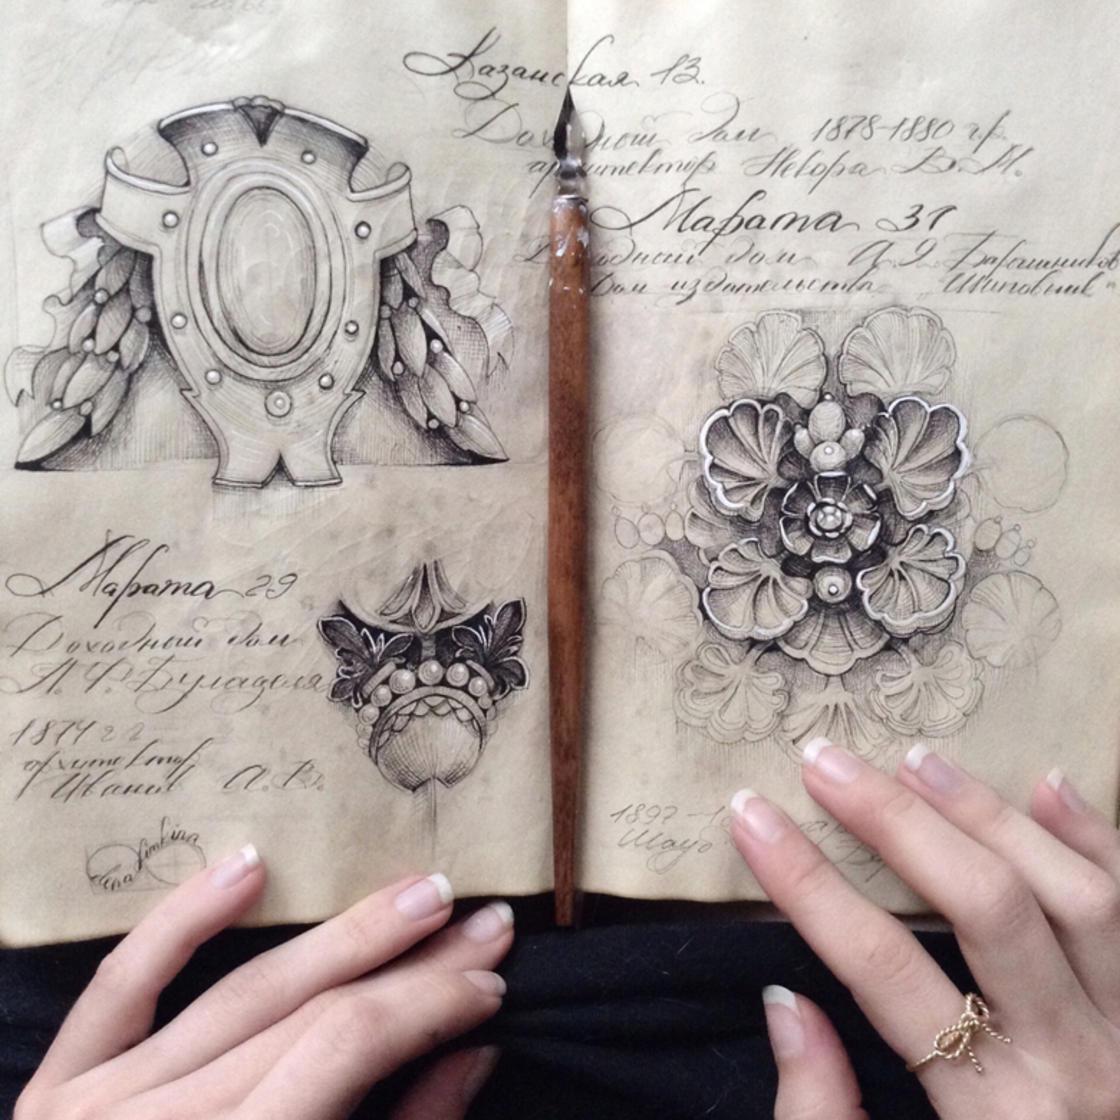 Une plongee dans le sketchbook fascinant de l'artiste Elena Limkina